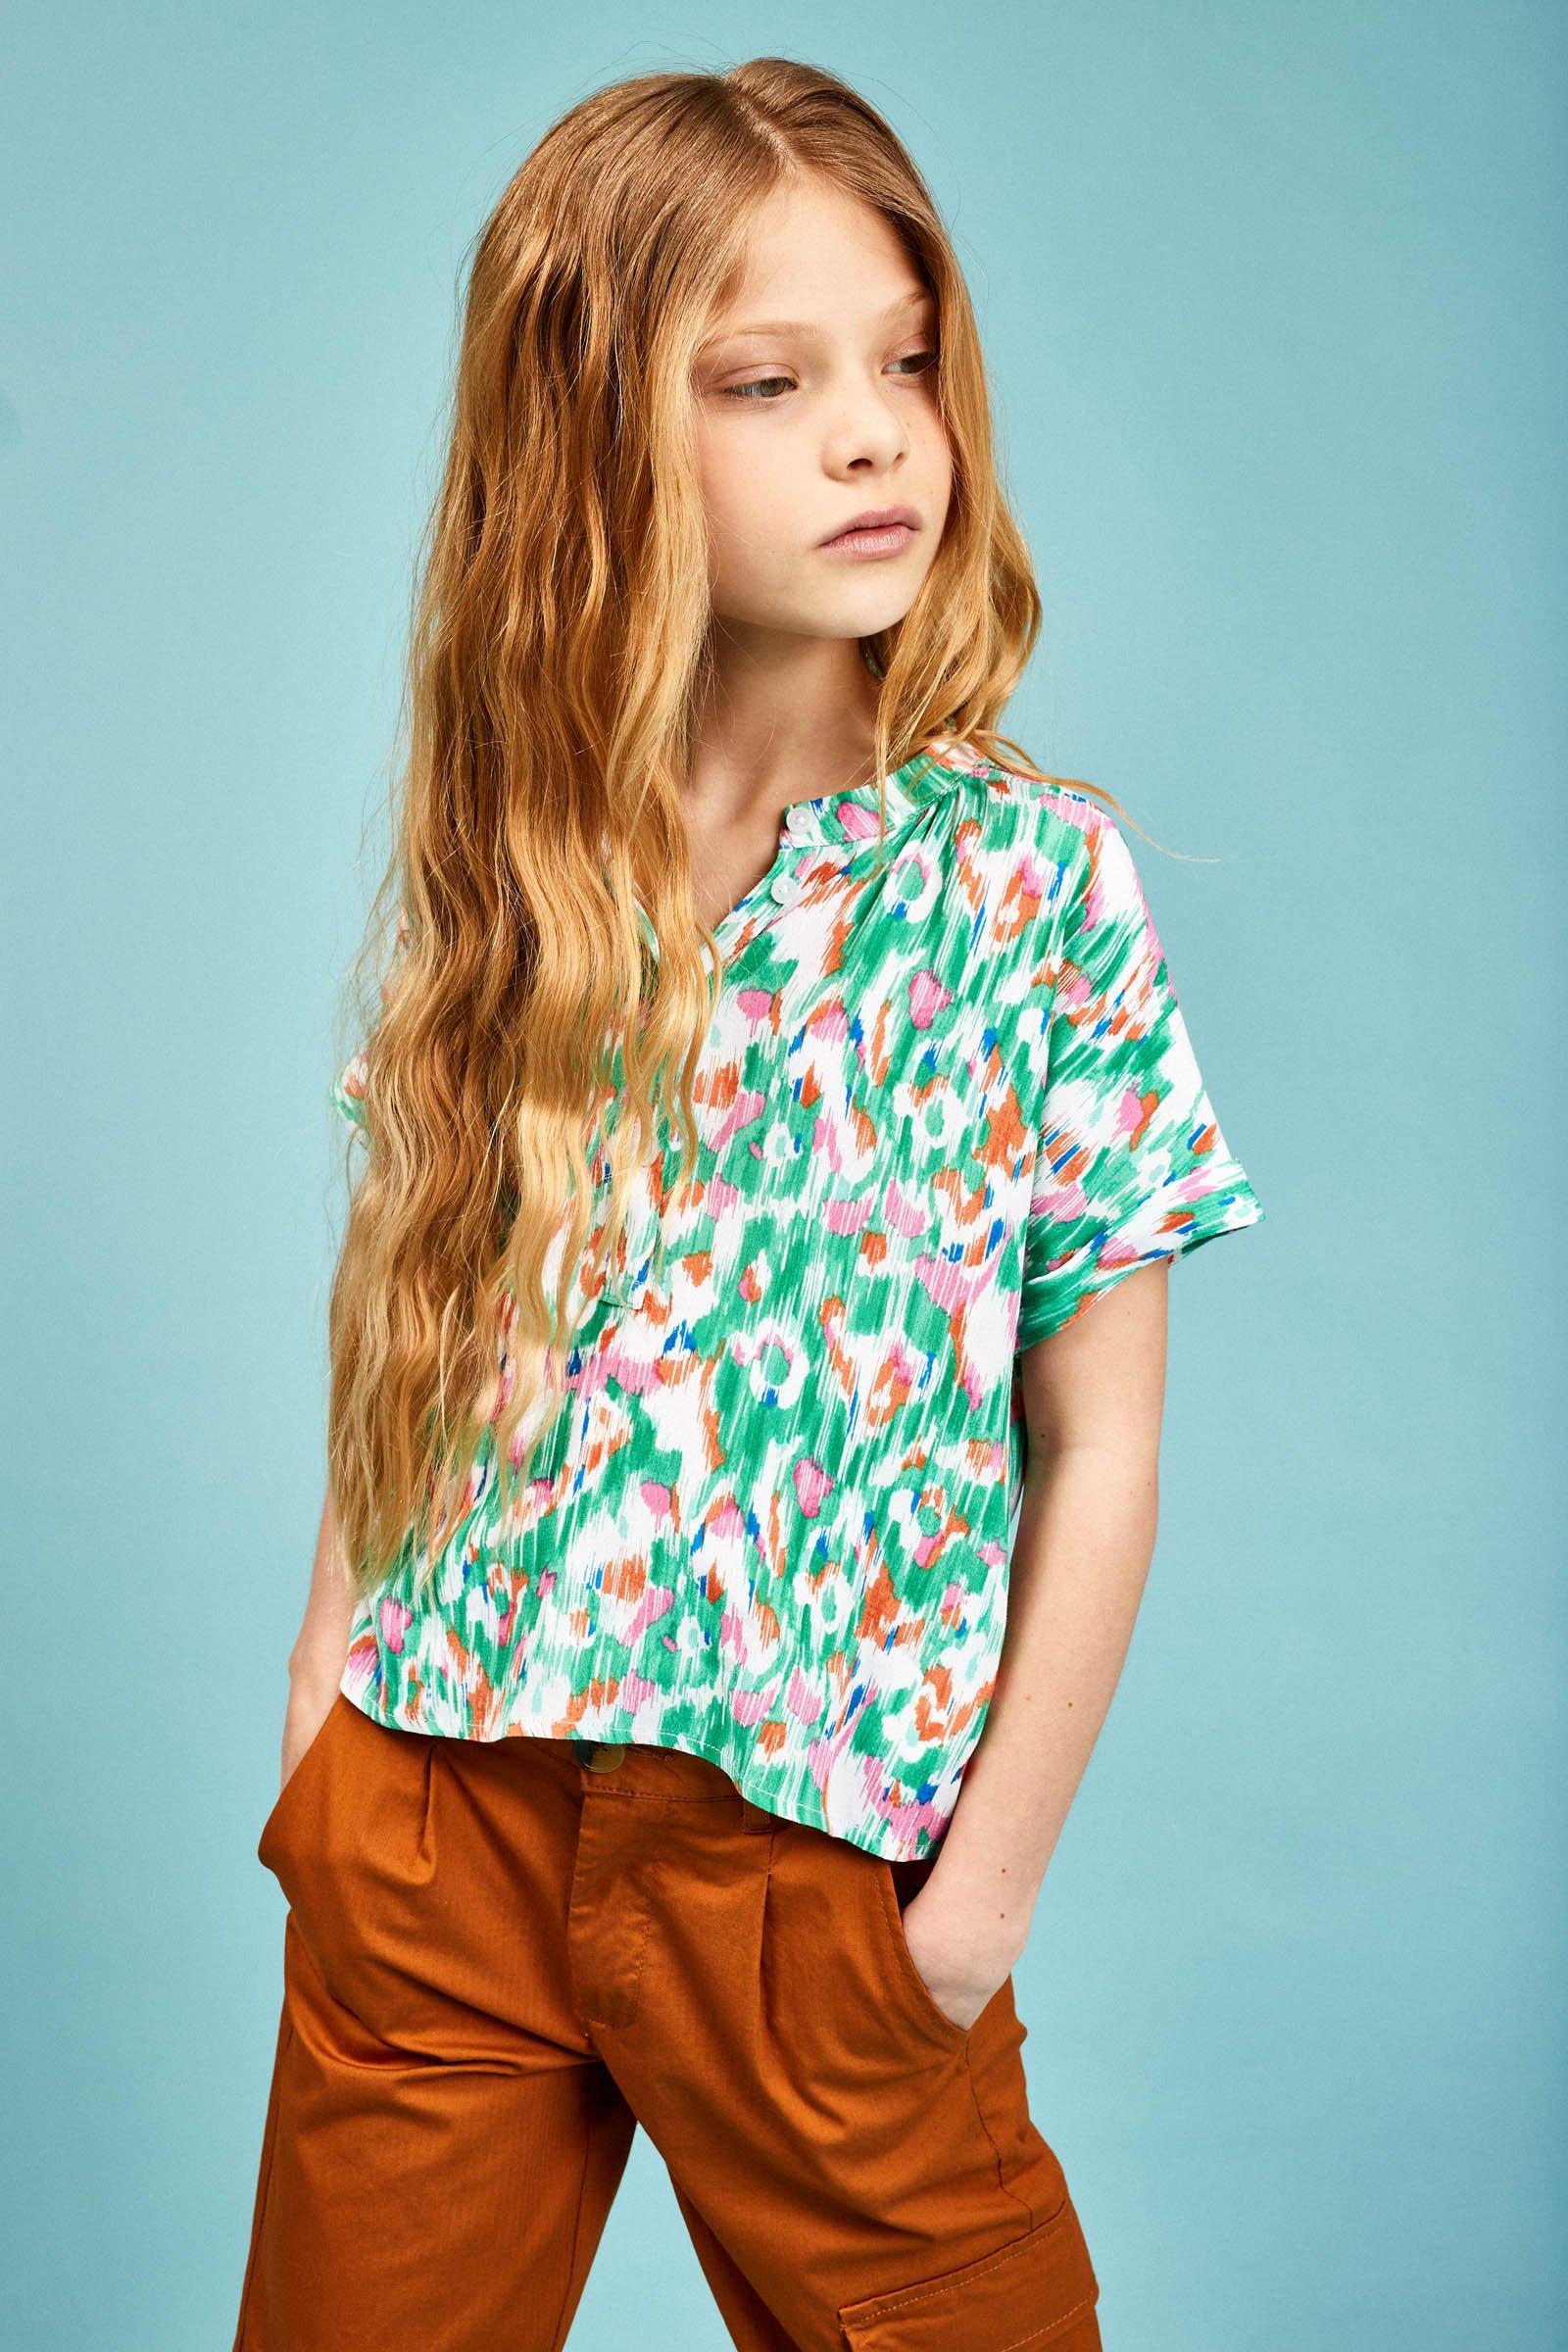 CKS Kids - EBOW - blouse lange mouwen - meerkleurig